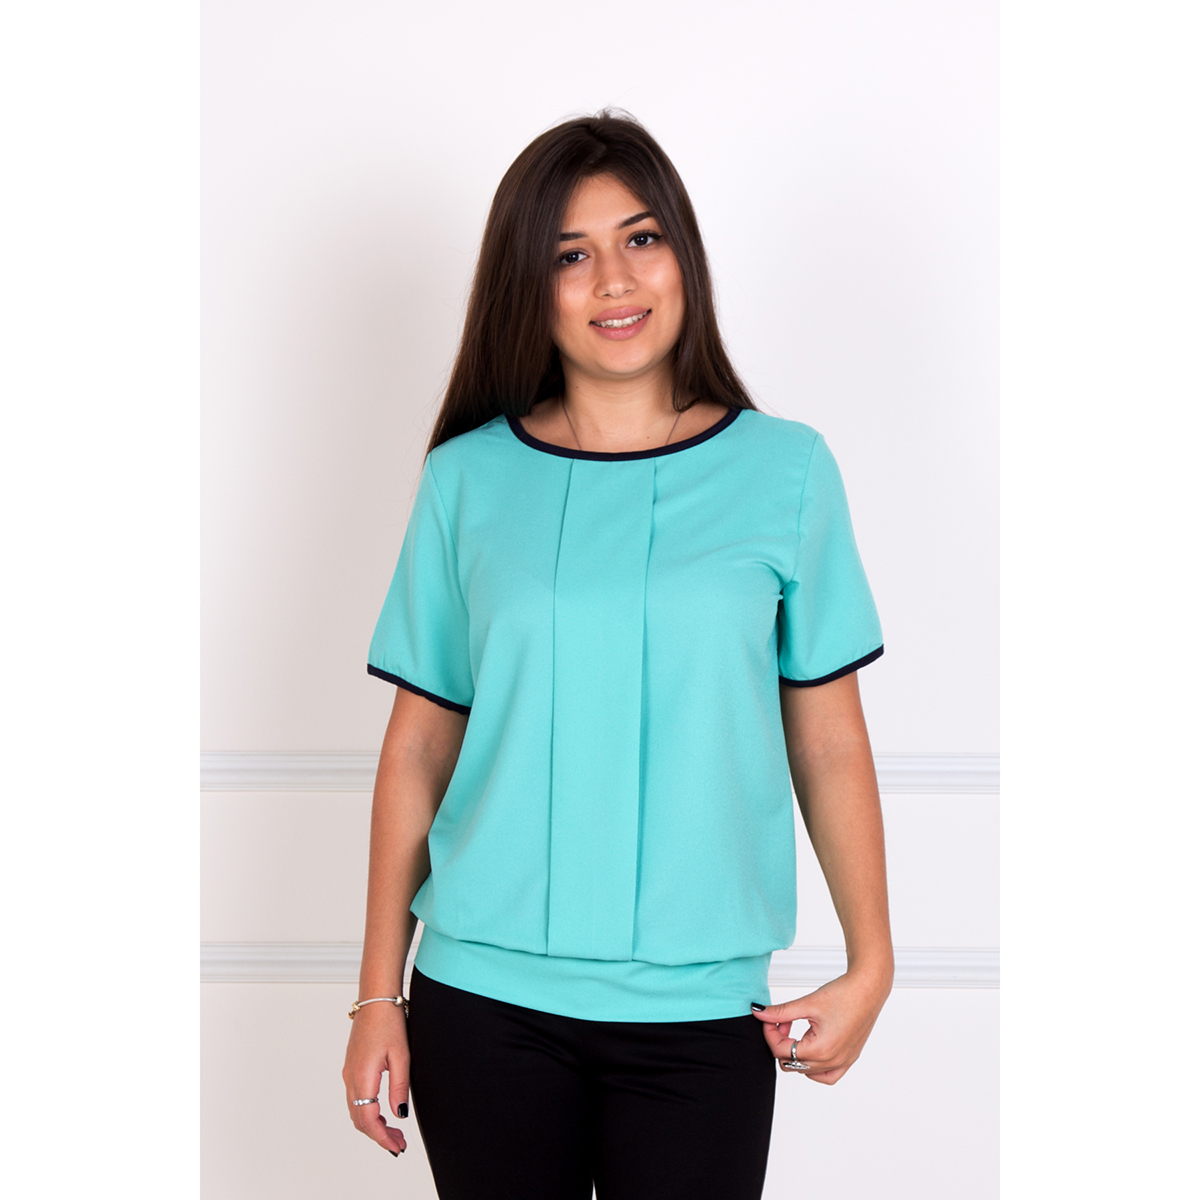 Женская блуза Кира Бирюзовый, размер 54Блузы<br>Обхват груди:108 см<br>Обхват талии:88 см<br>Обхват бедер:116 см<br>Рост:167 см<br><br>Тип: Жен. блуза<br>Размер: 54<br>Материал: Креп